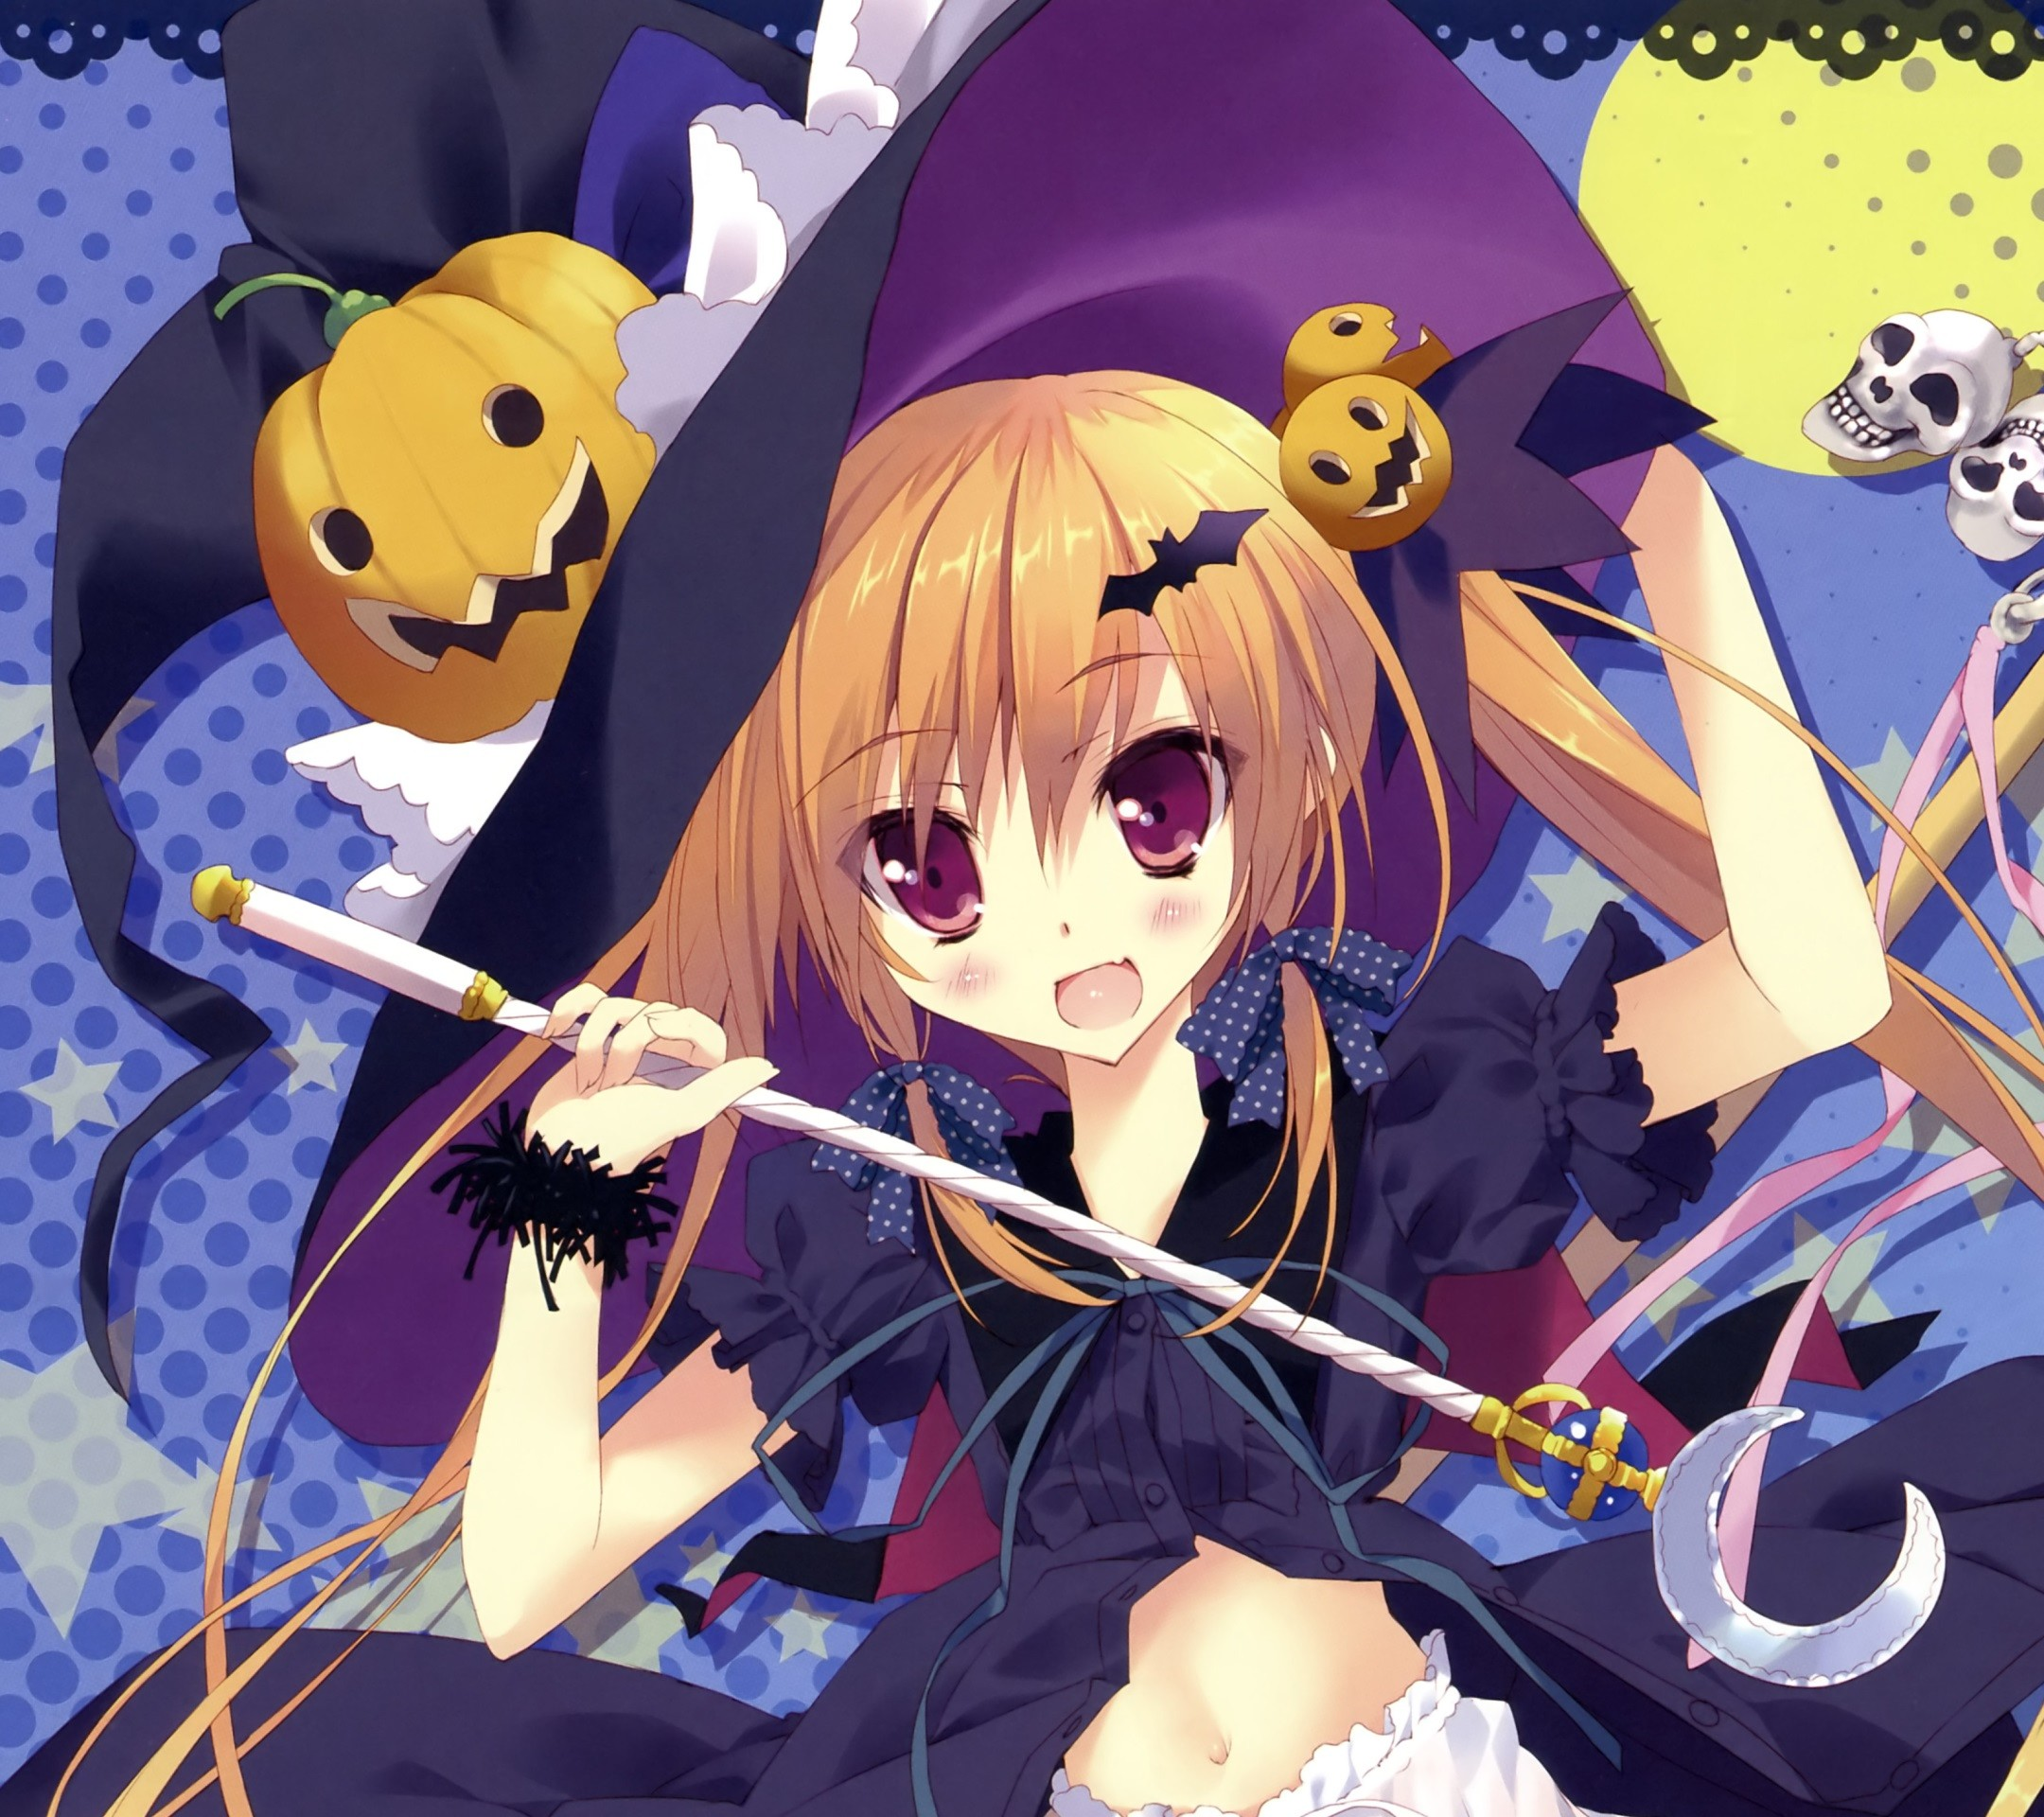 Kawaii Halloween Wallpaper (62+ images)